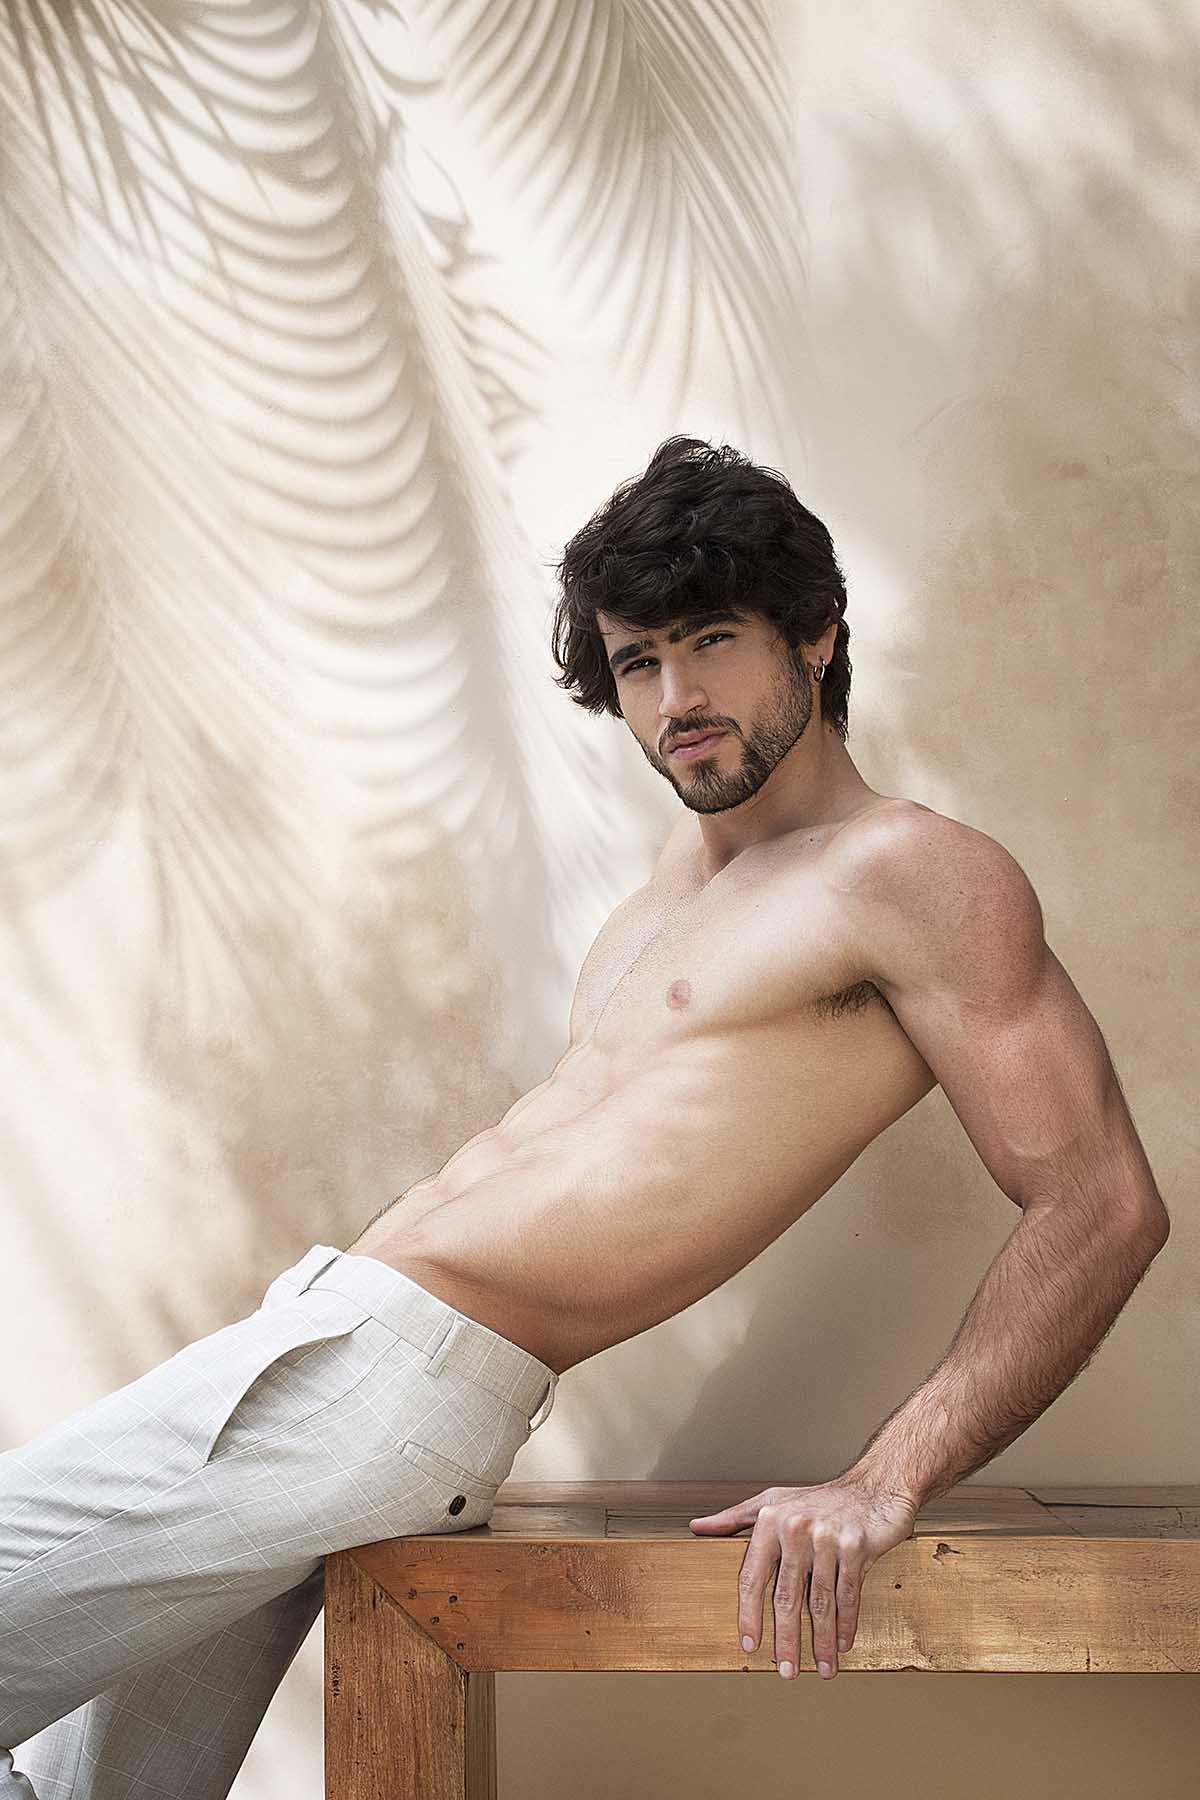 Filipe Renan by Rodrigo Moura for Brazilian Male Model